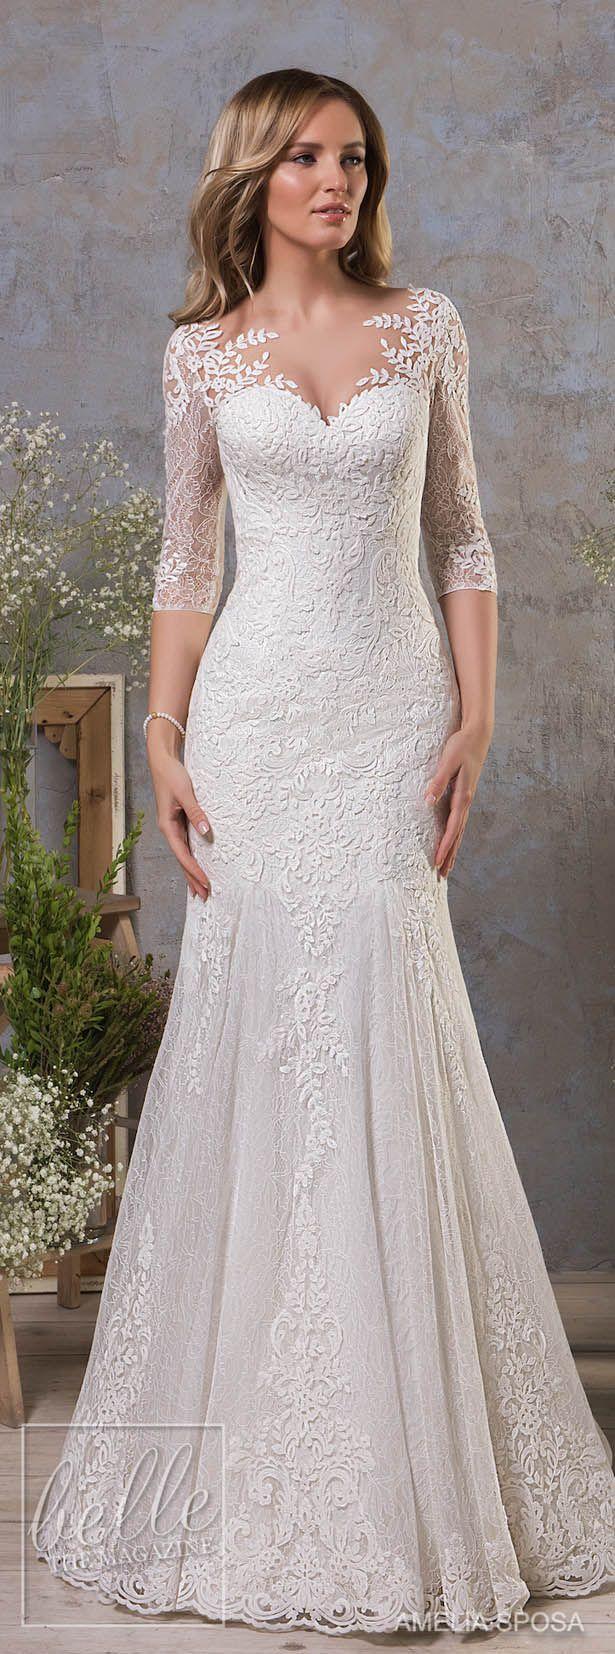 Amelia Sposa Fall 2018 Wedding Dresses | Ärmelhochzeitskleider ...